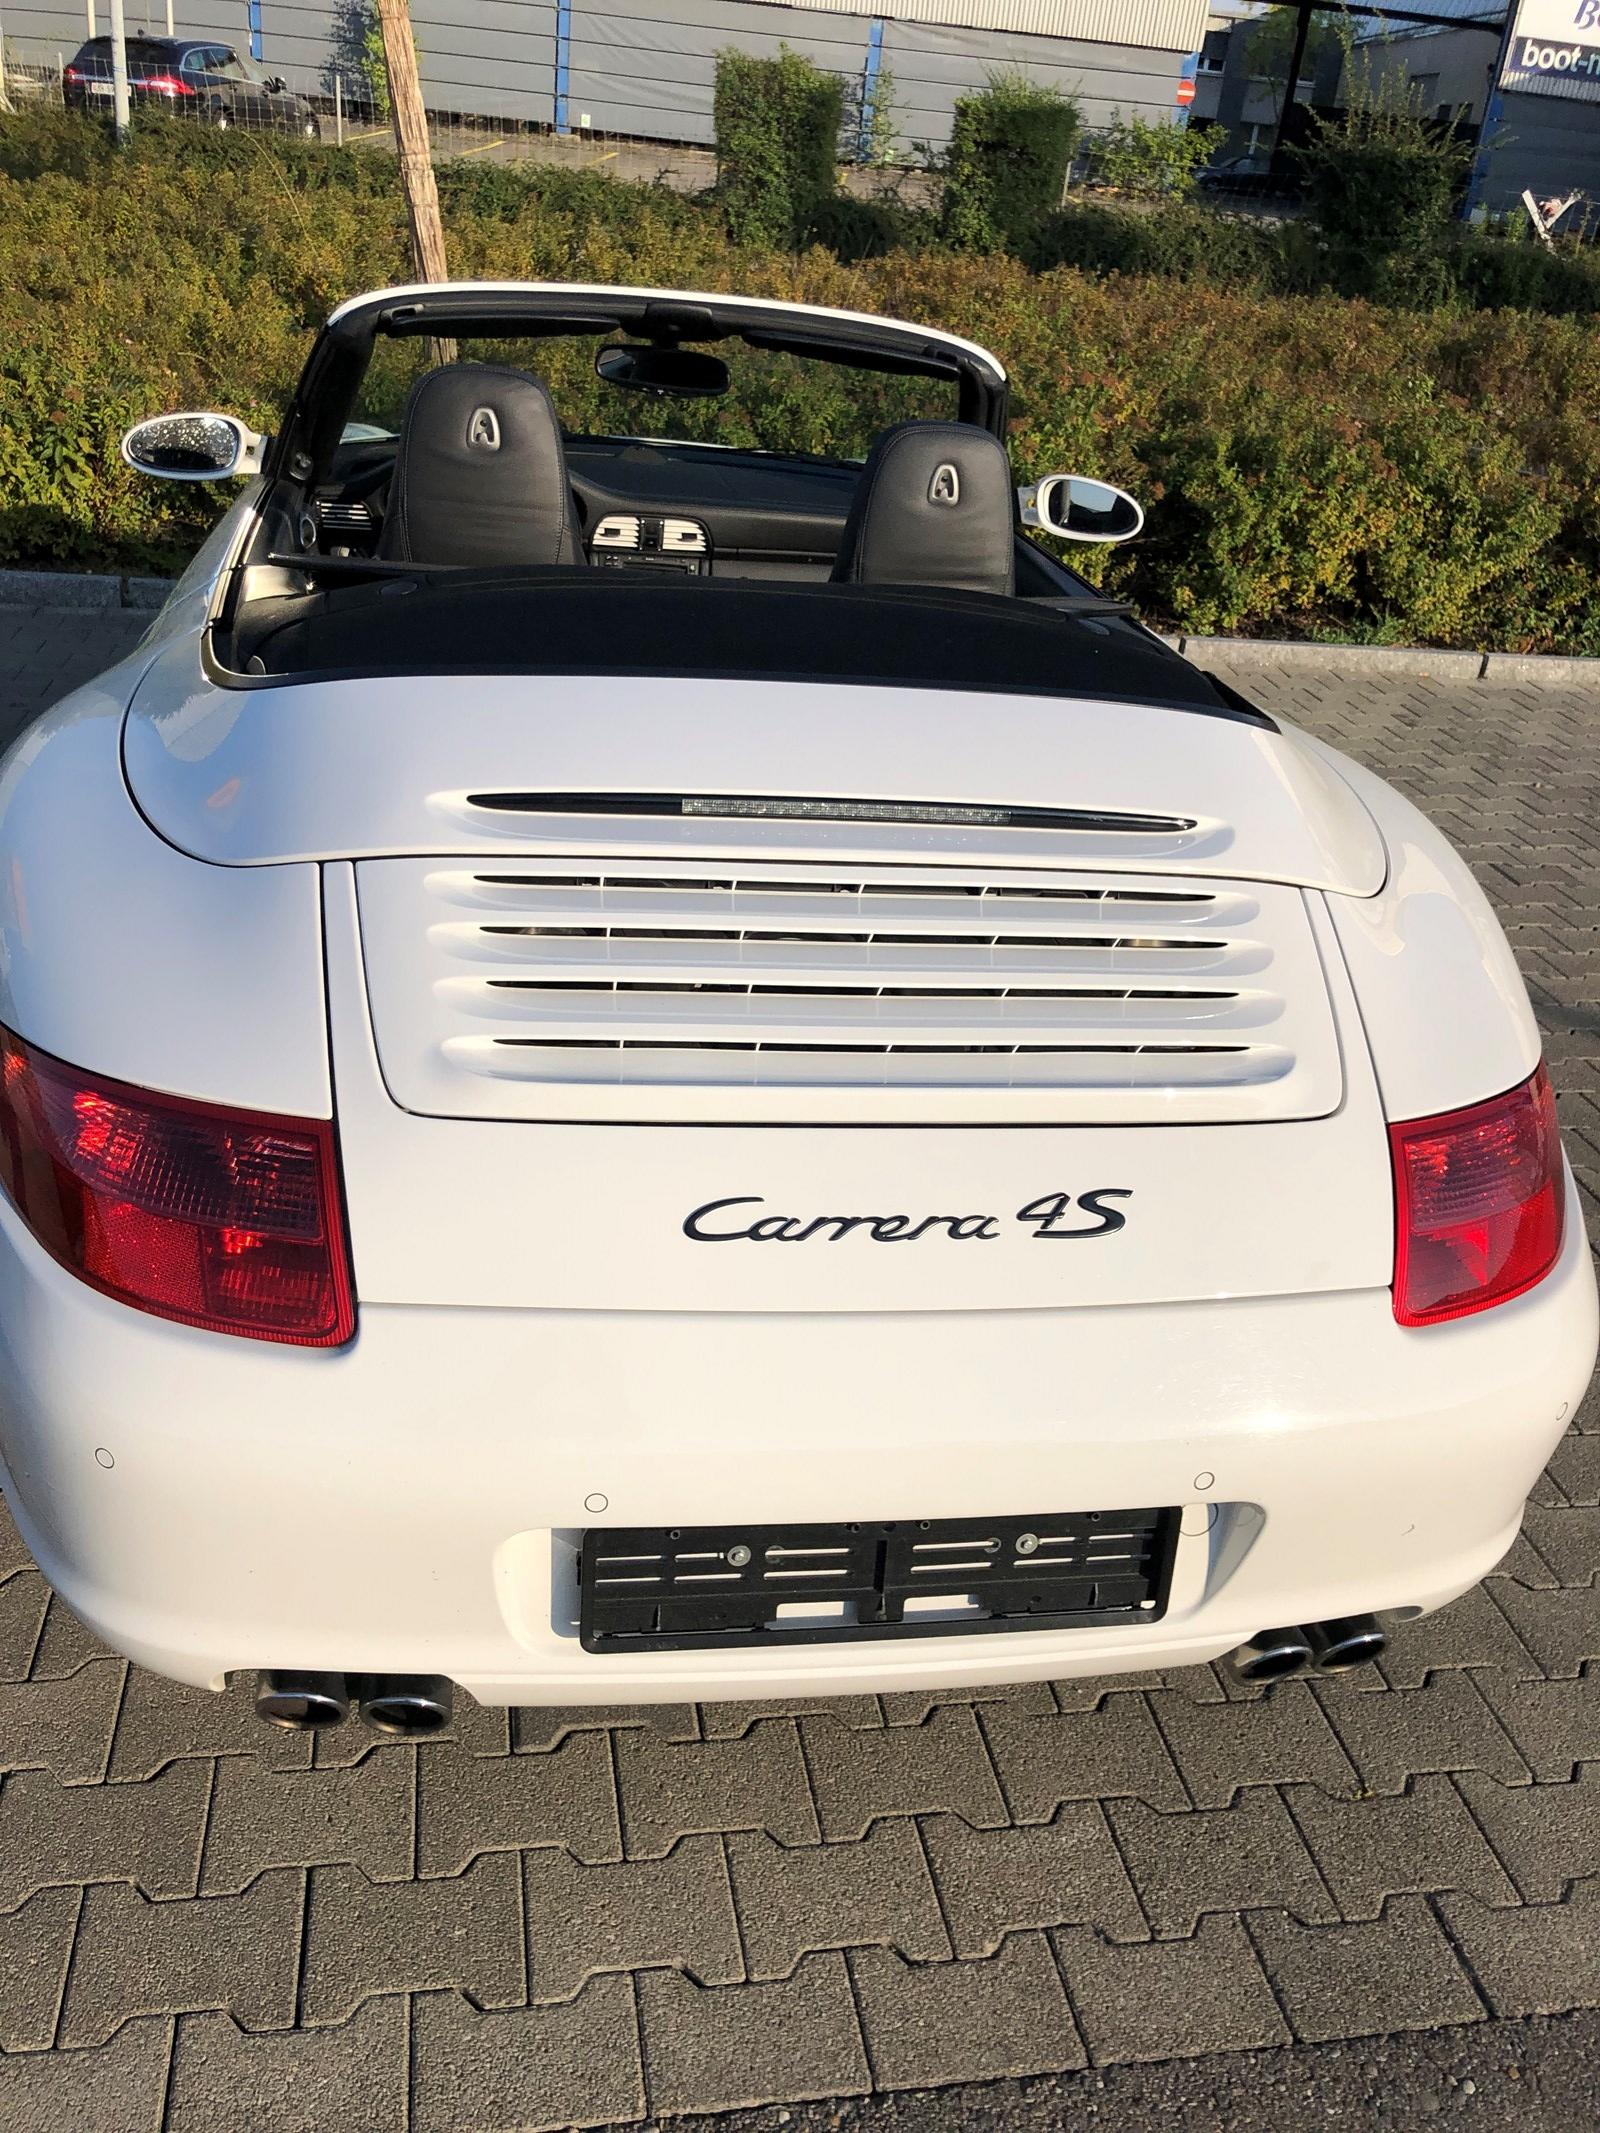 Porsche 911 Cabriolet 3.8 Carrera 4S